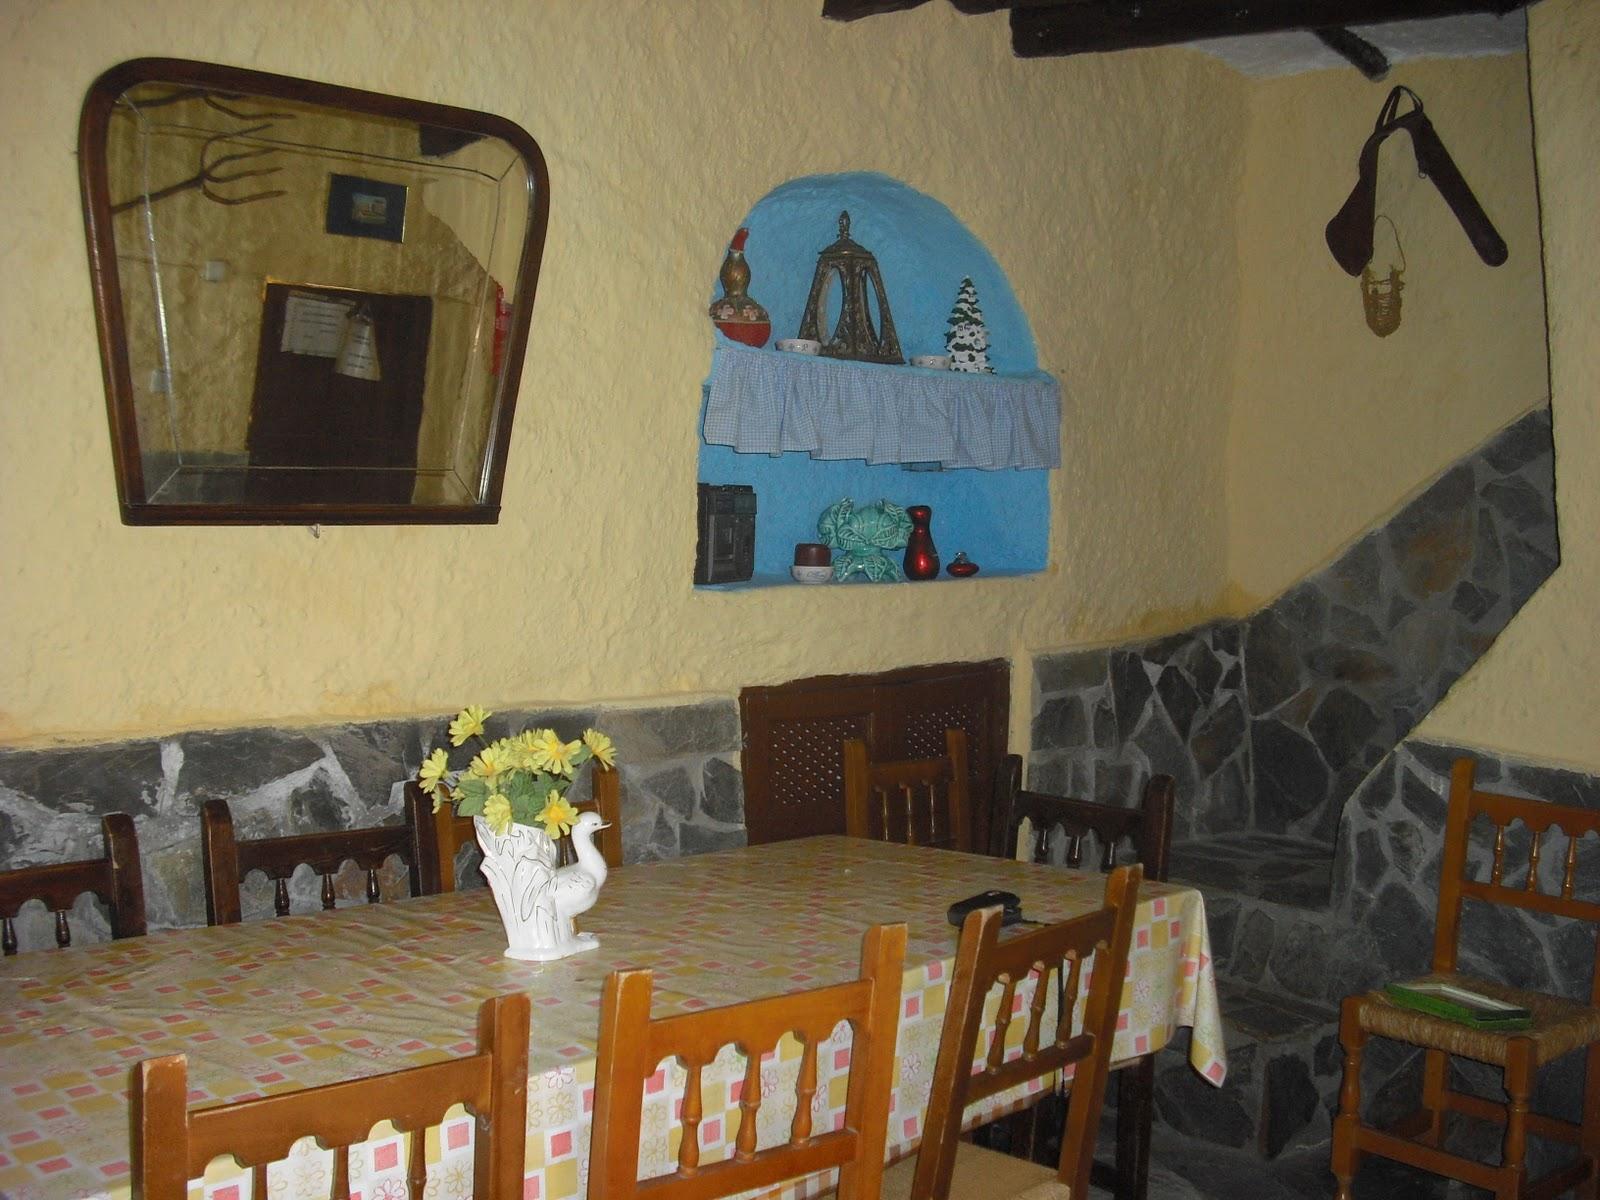 Casas Rsticas en Aulago Casa rstica El Escondite